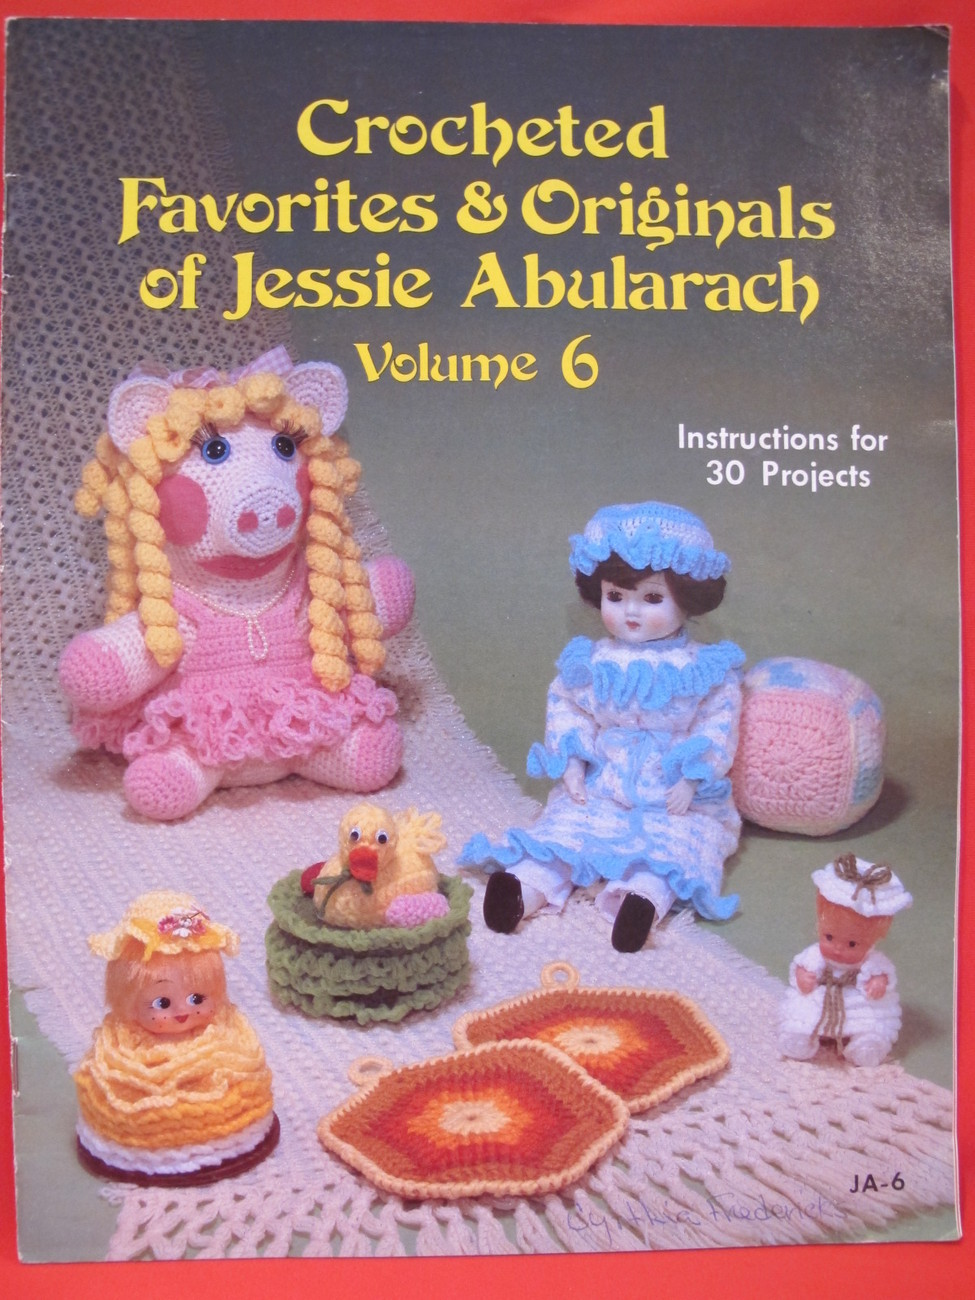 Vintage Crochet Crocheting Patterns Toys Dolls Christmas Clown Pillow Flower etc - $9.95